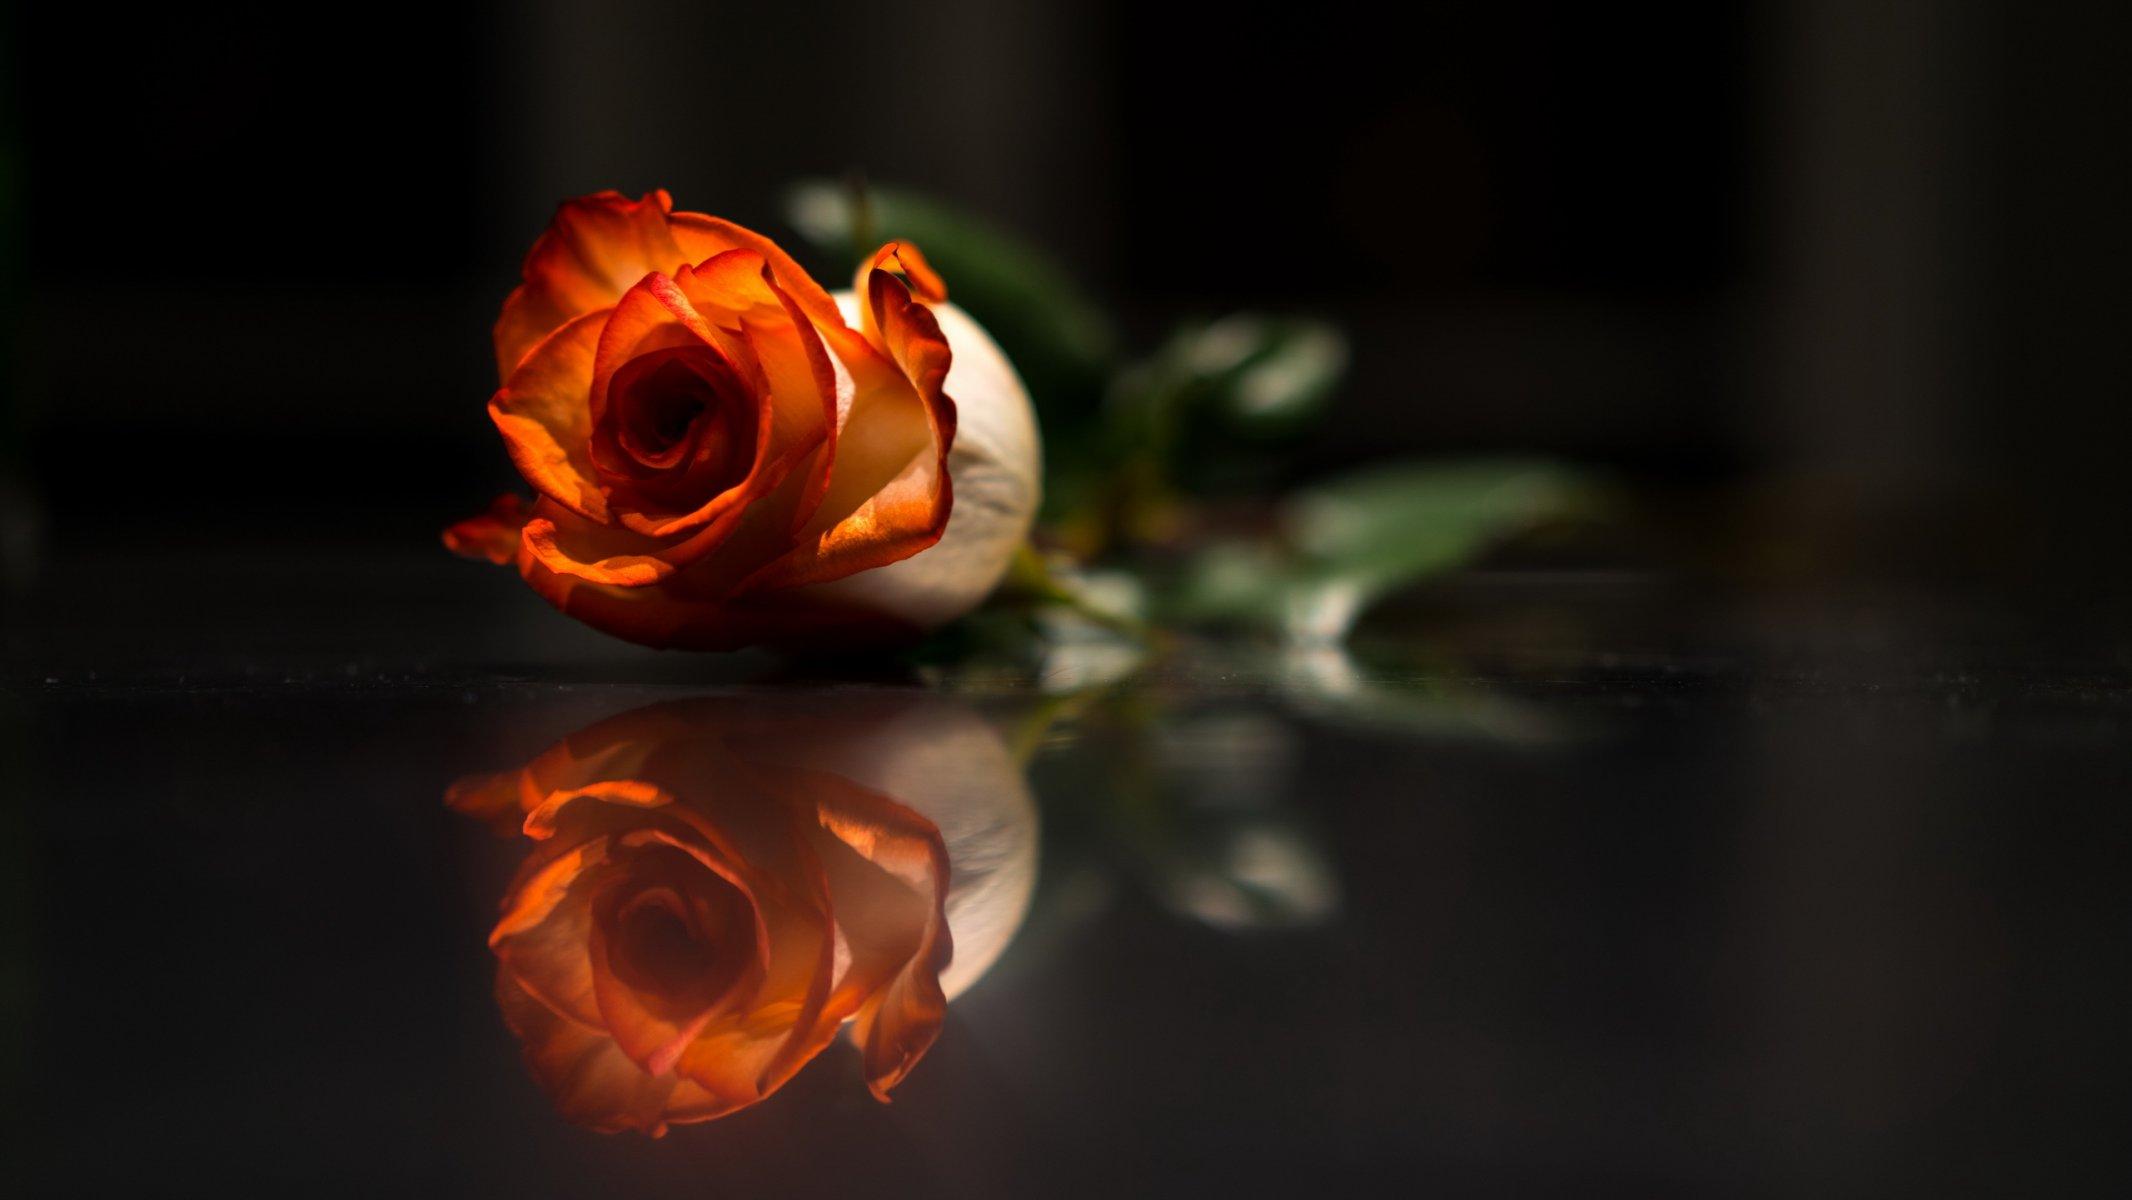 фото роз на темном фоне модели удобны хорошо